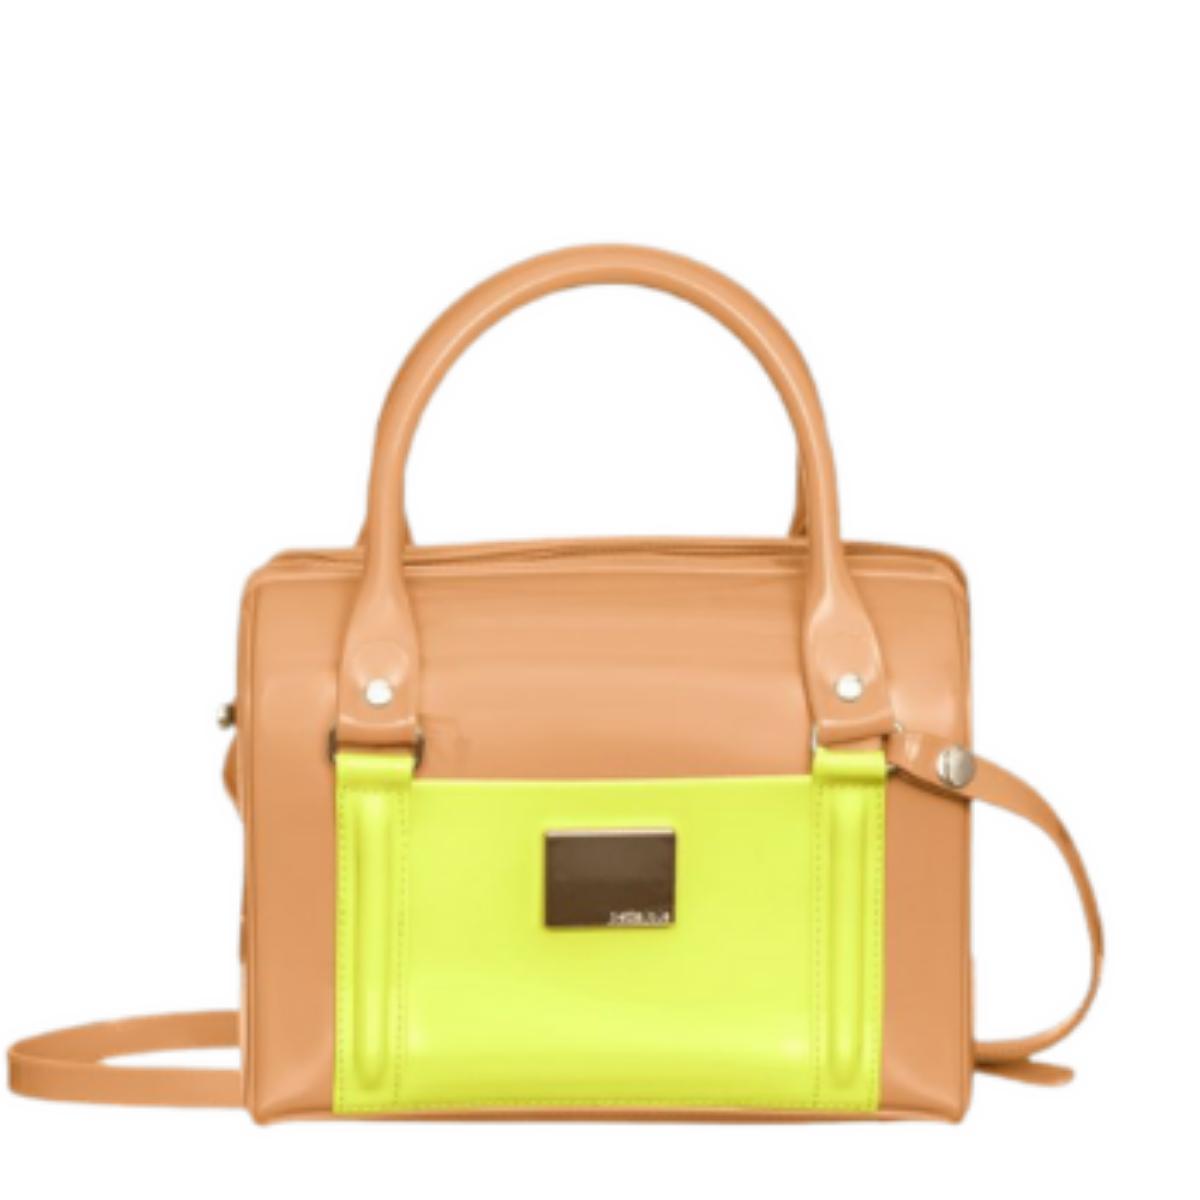 Bolsa Petite Jolie PJ10142 Lana New Camel / Amarelo Neon